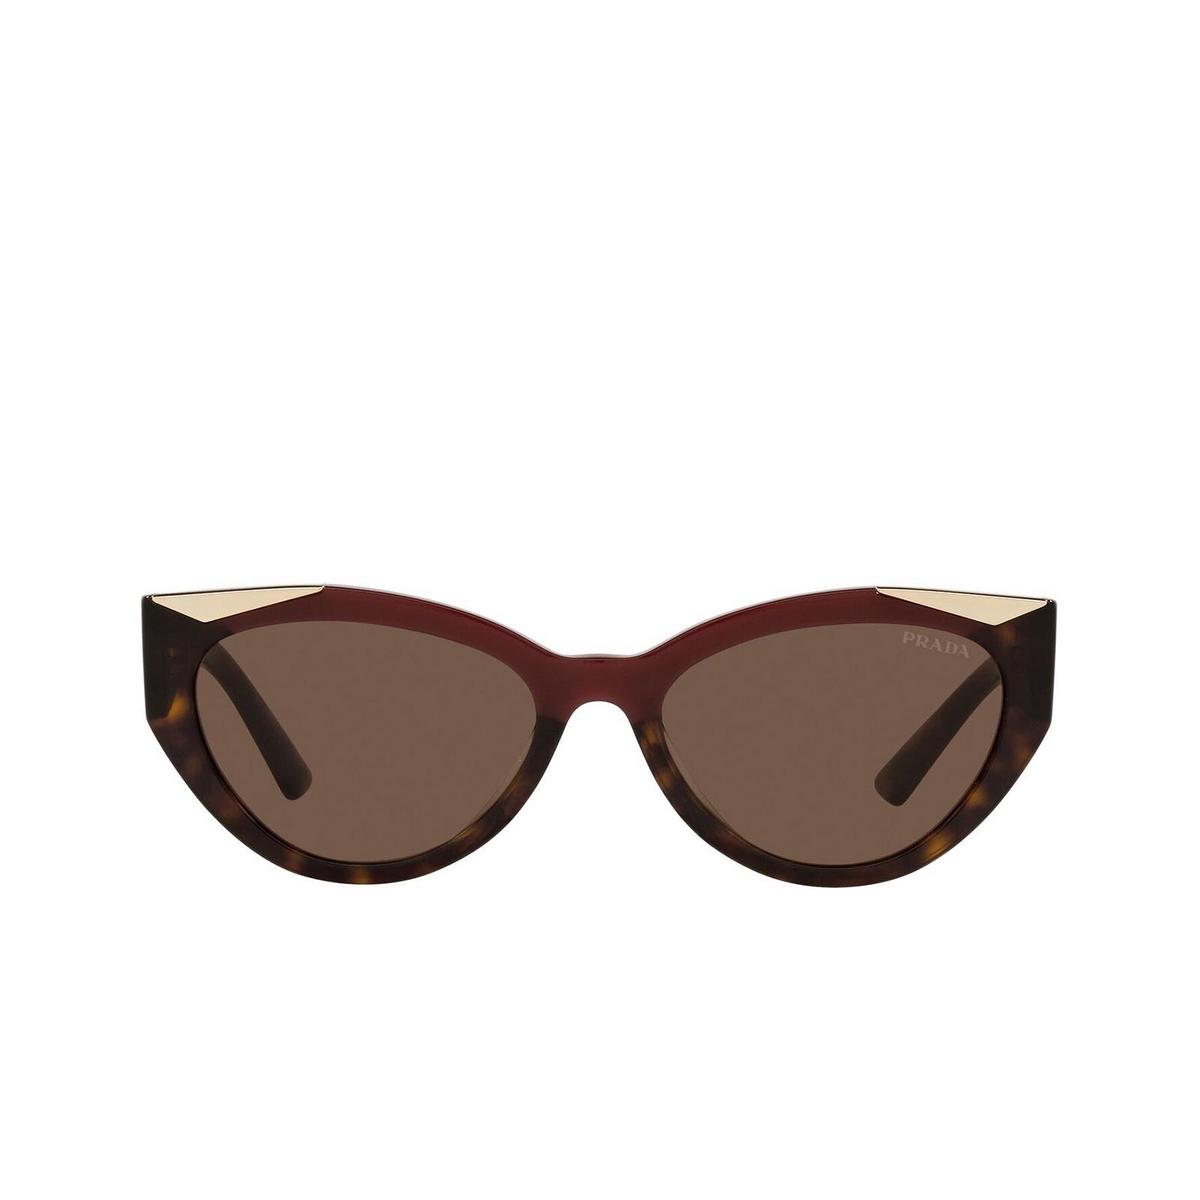 Prada® Cat-eye Sunglasses: PR 03WS color Cherry/dark Havana 07C0D1.